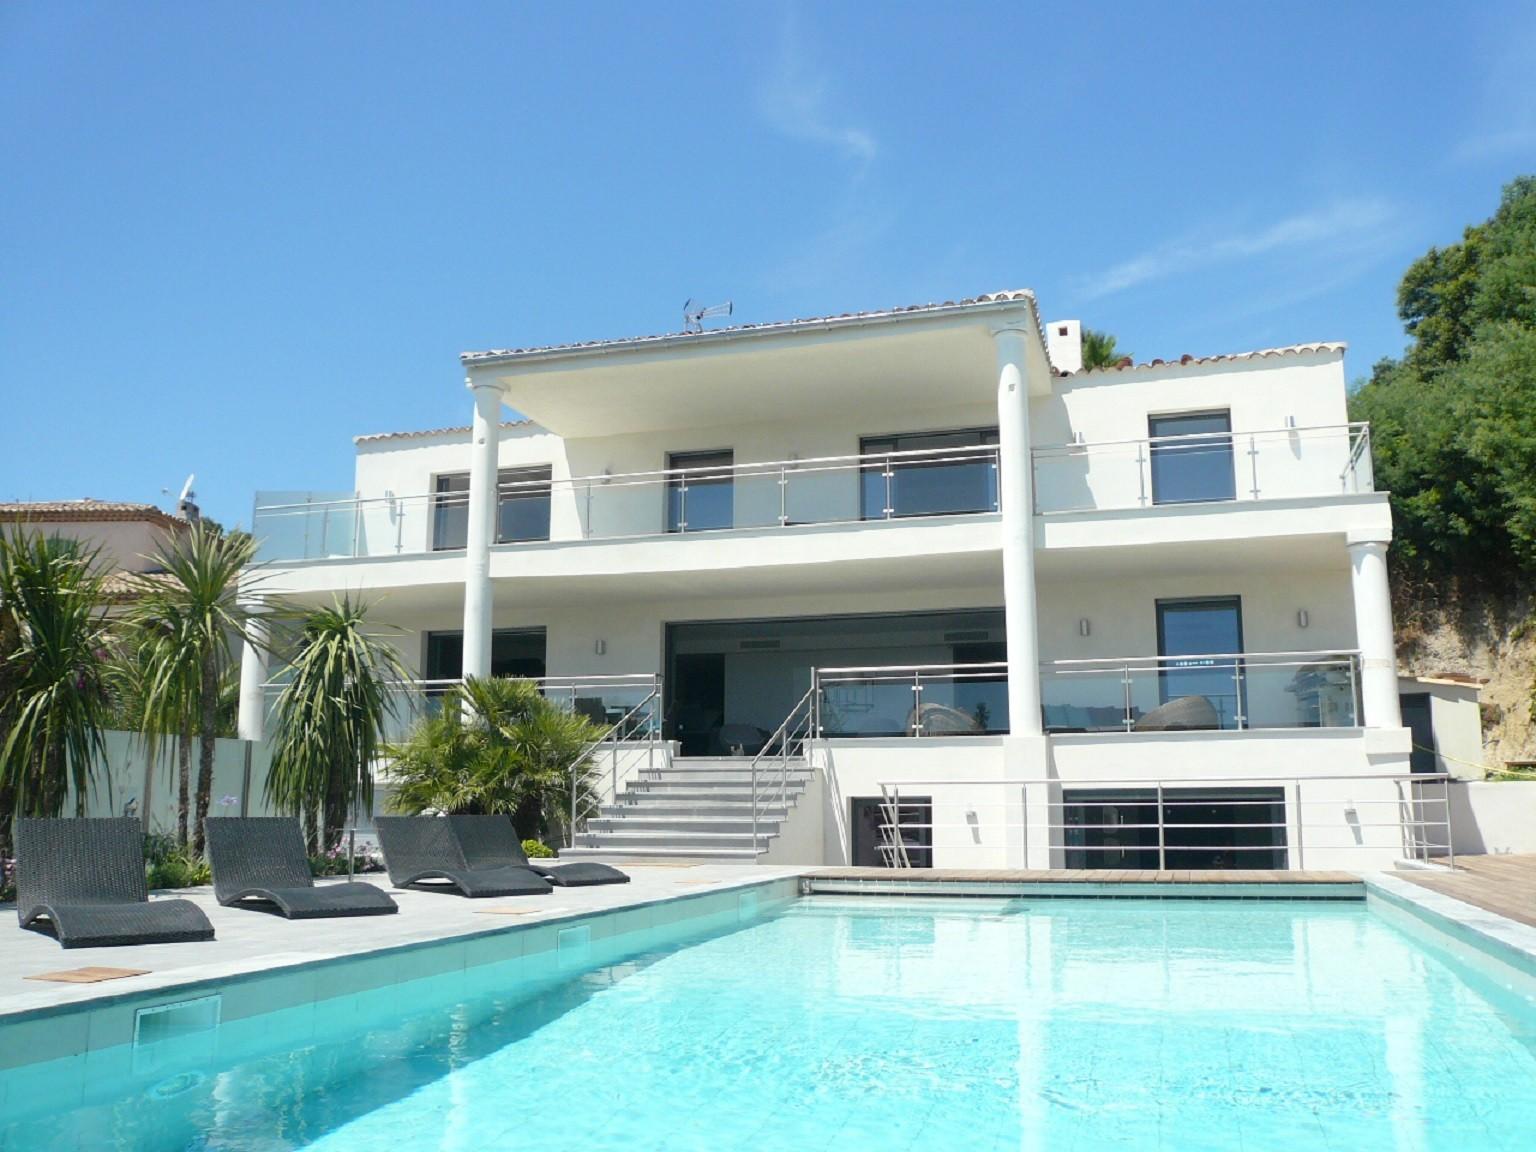 Belle villa avec piscine antibes - Location villa collioure avec piscine ...